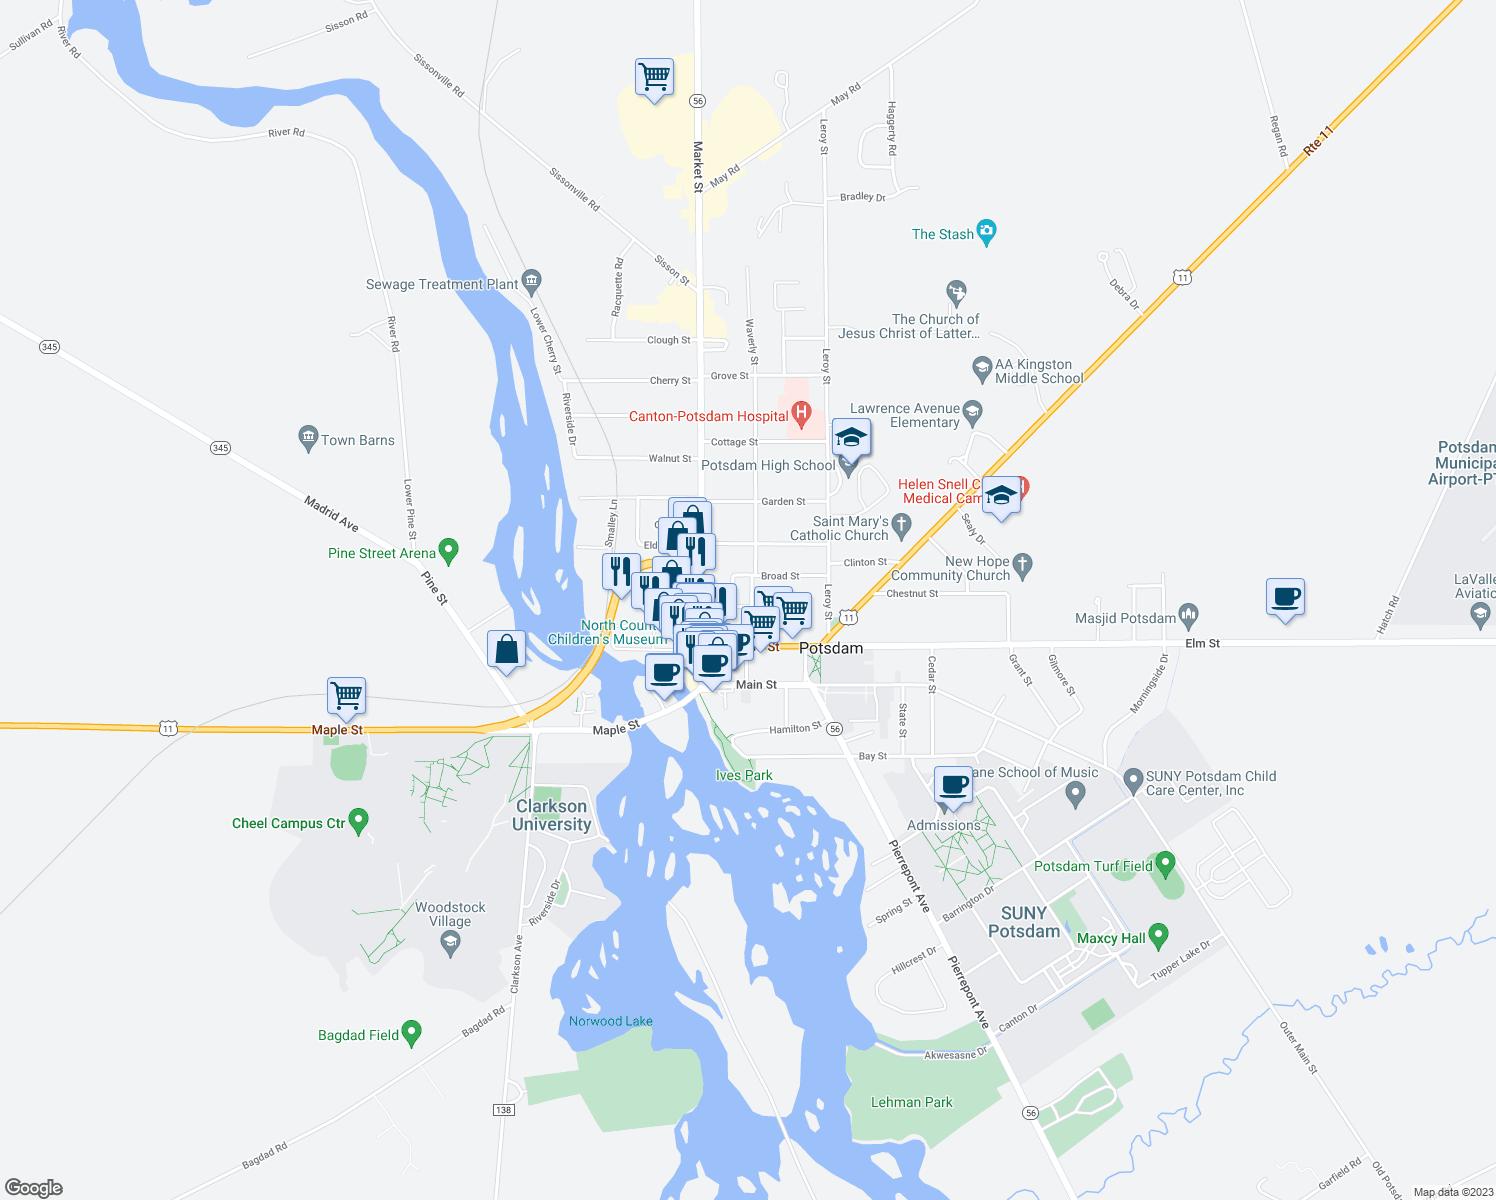 Restaurants Near Suny Potsdam